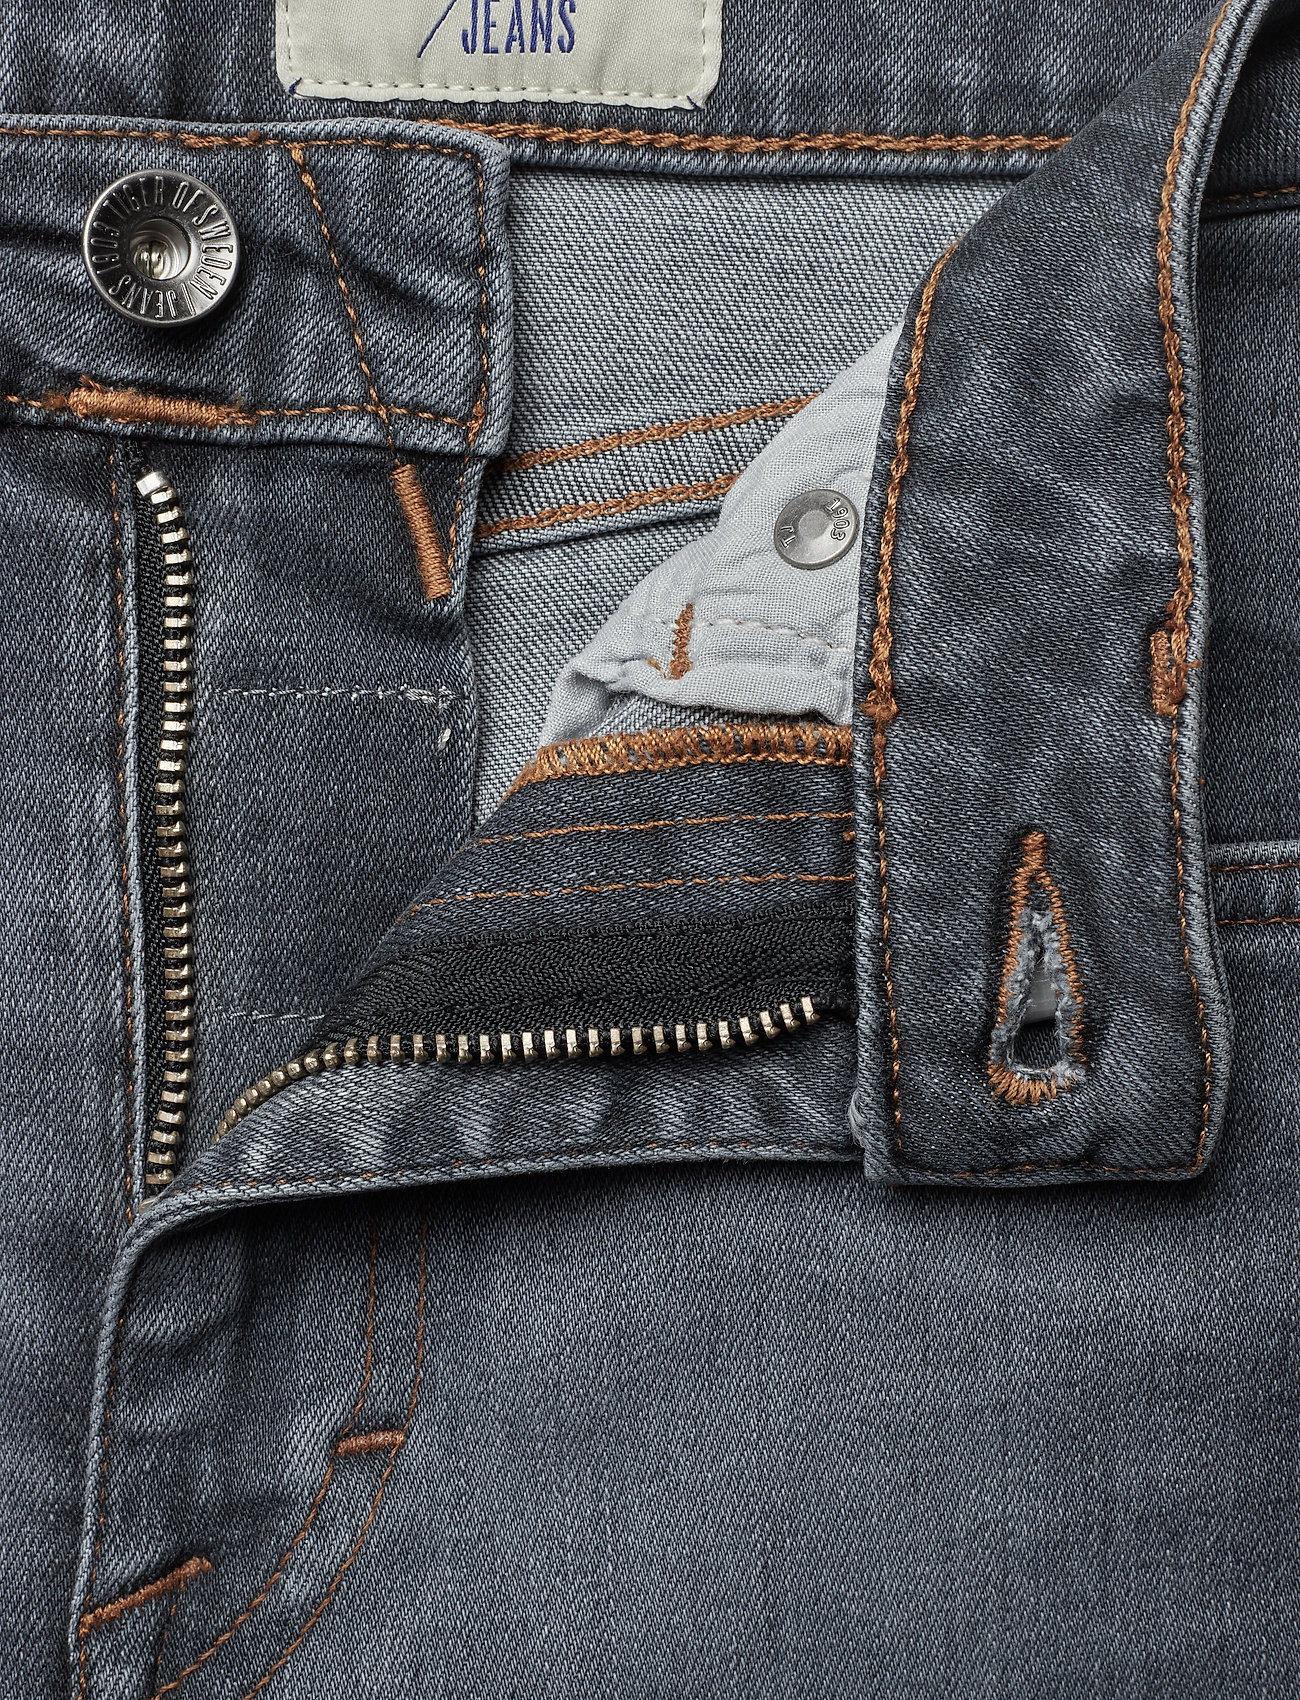 Jeans Sweden Jeans ShellyblackTiger ShellyblackTiger Of Sweden Of ShellyblackTiger Jeans Sweden Of SzpMVqU